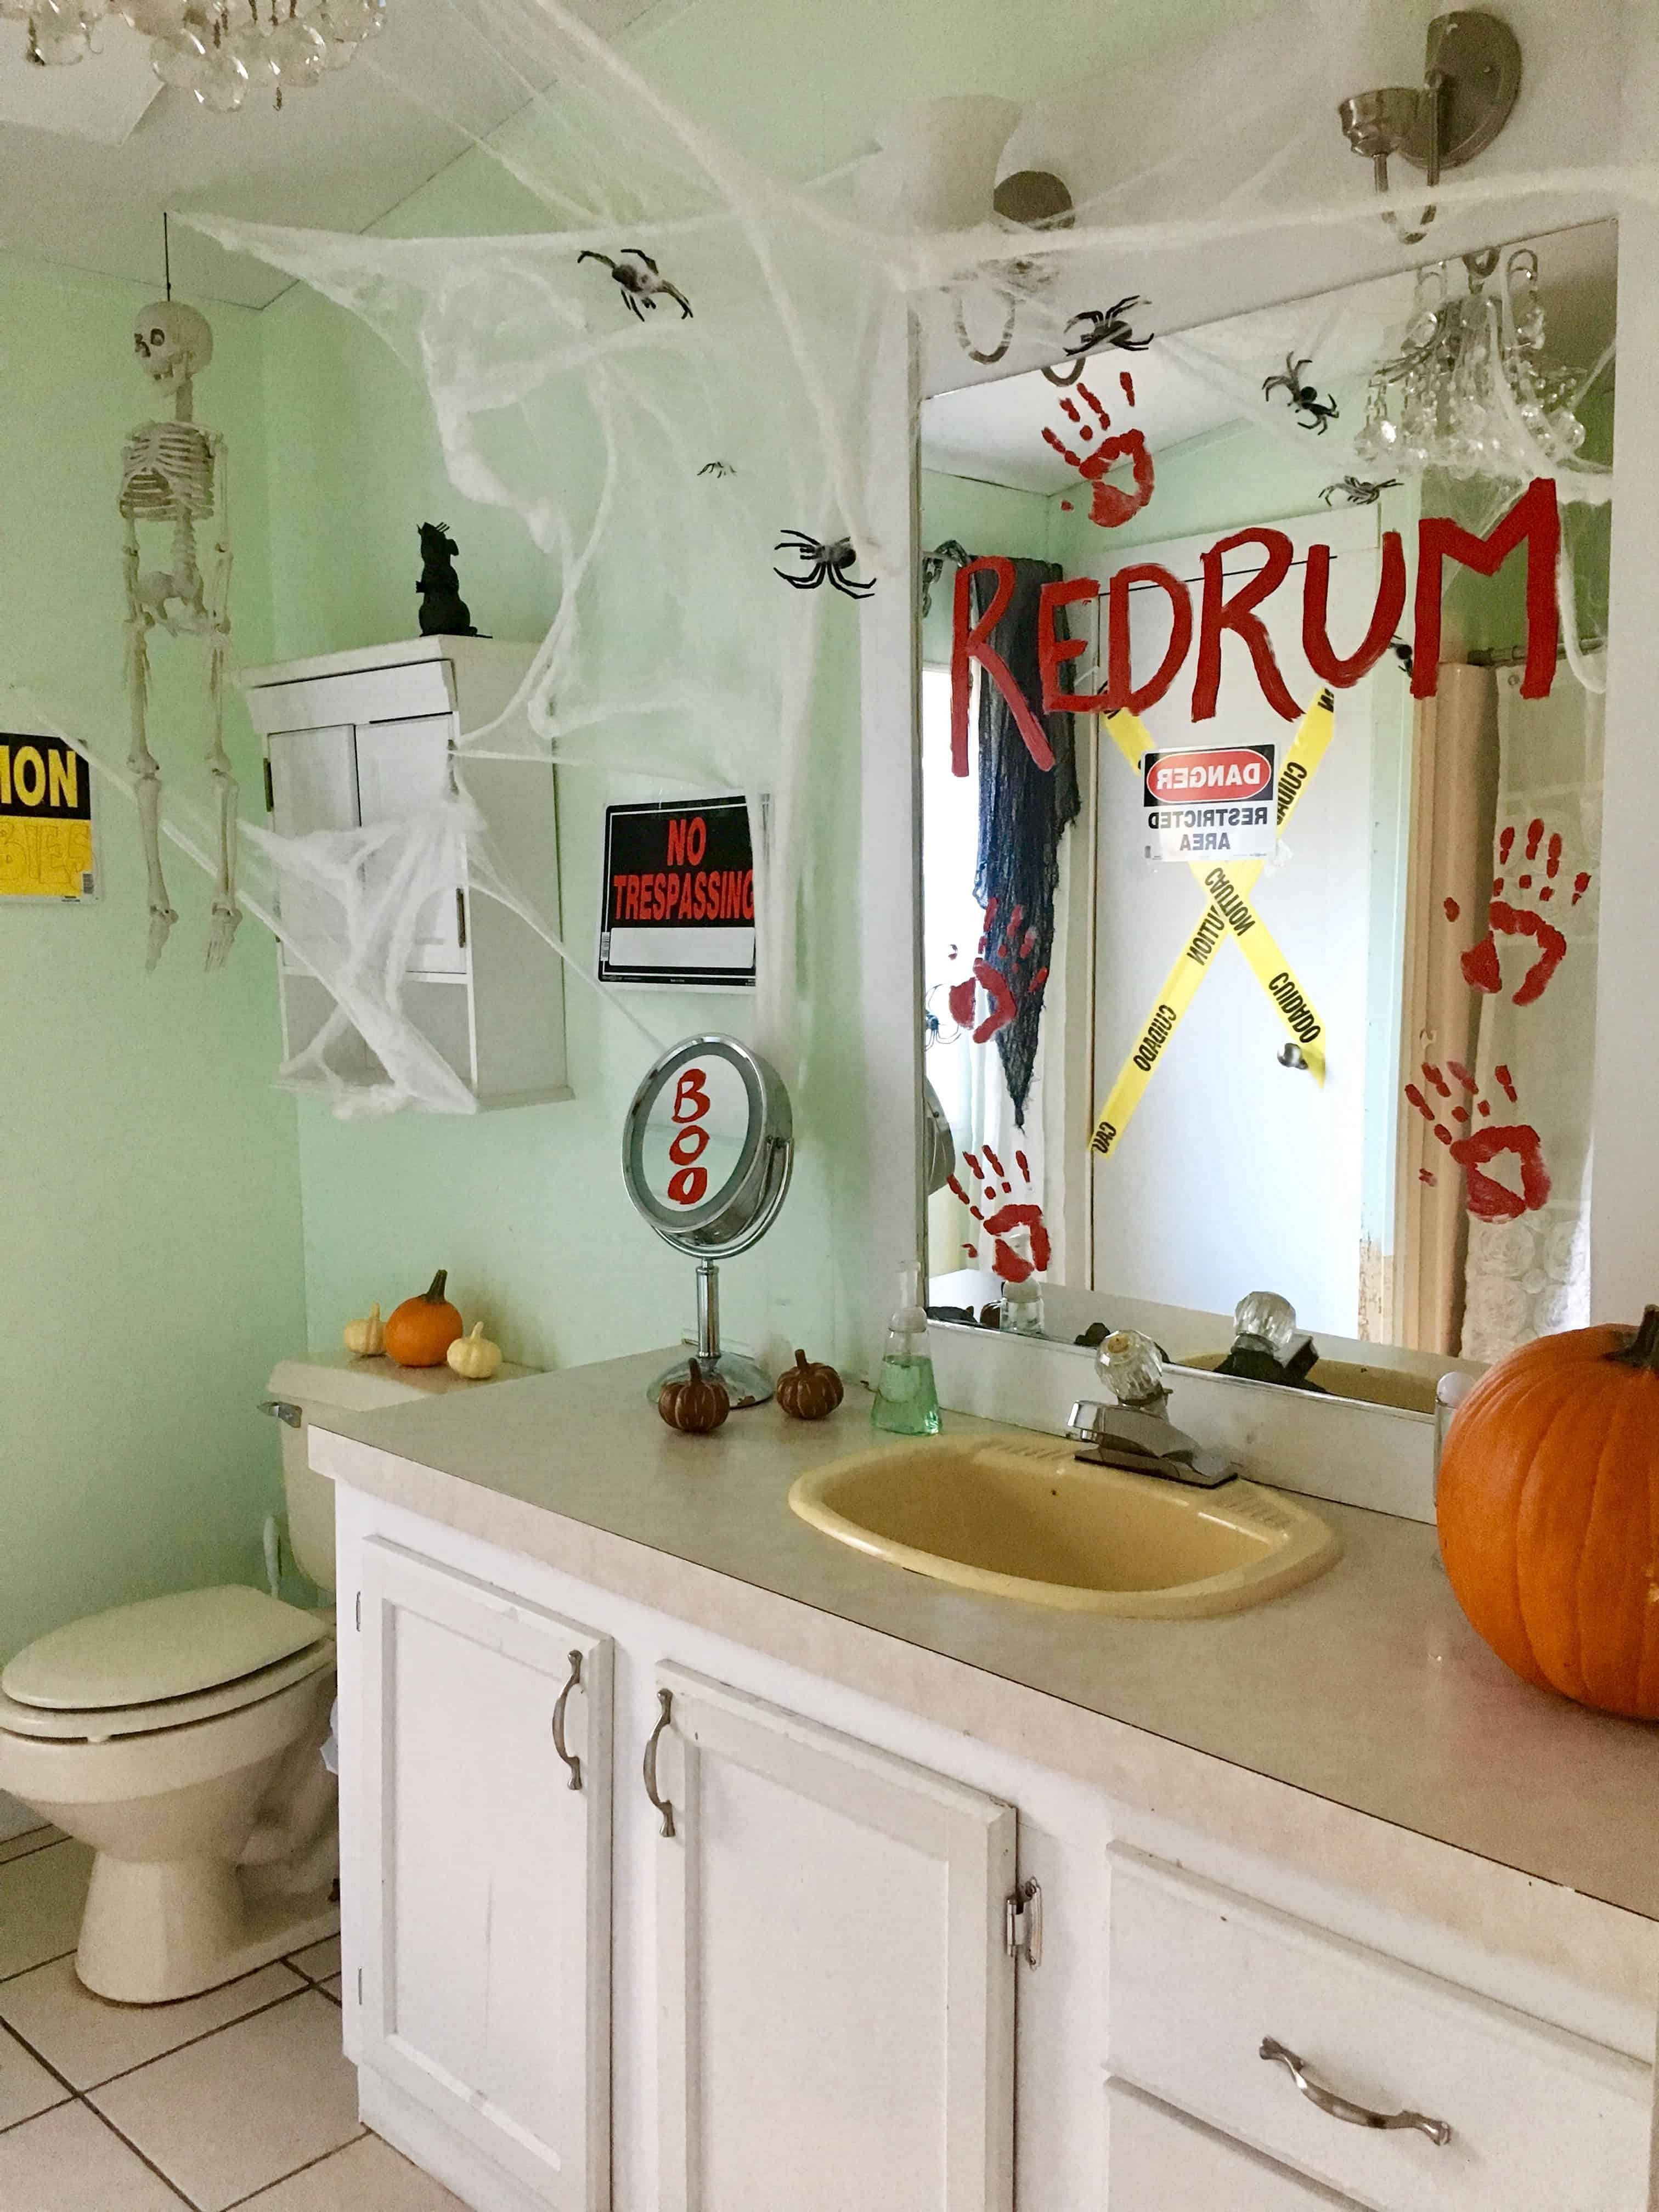 9 Unique Halloween Bathroom Decoration Ideas To Make The